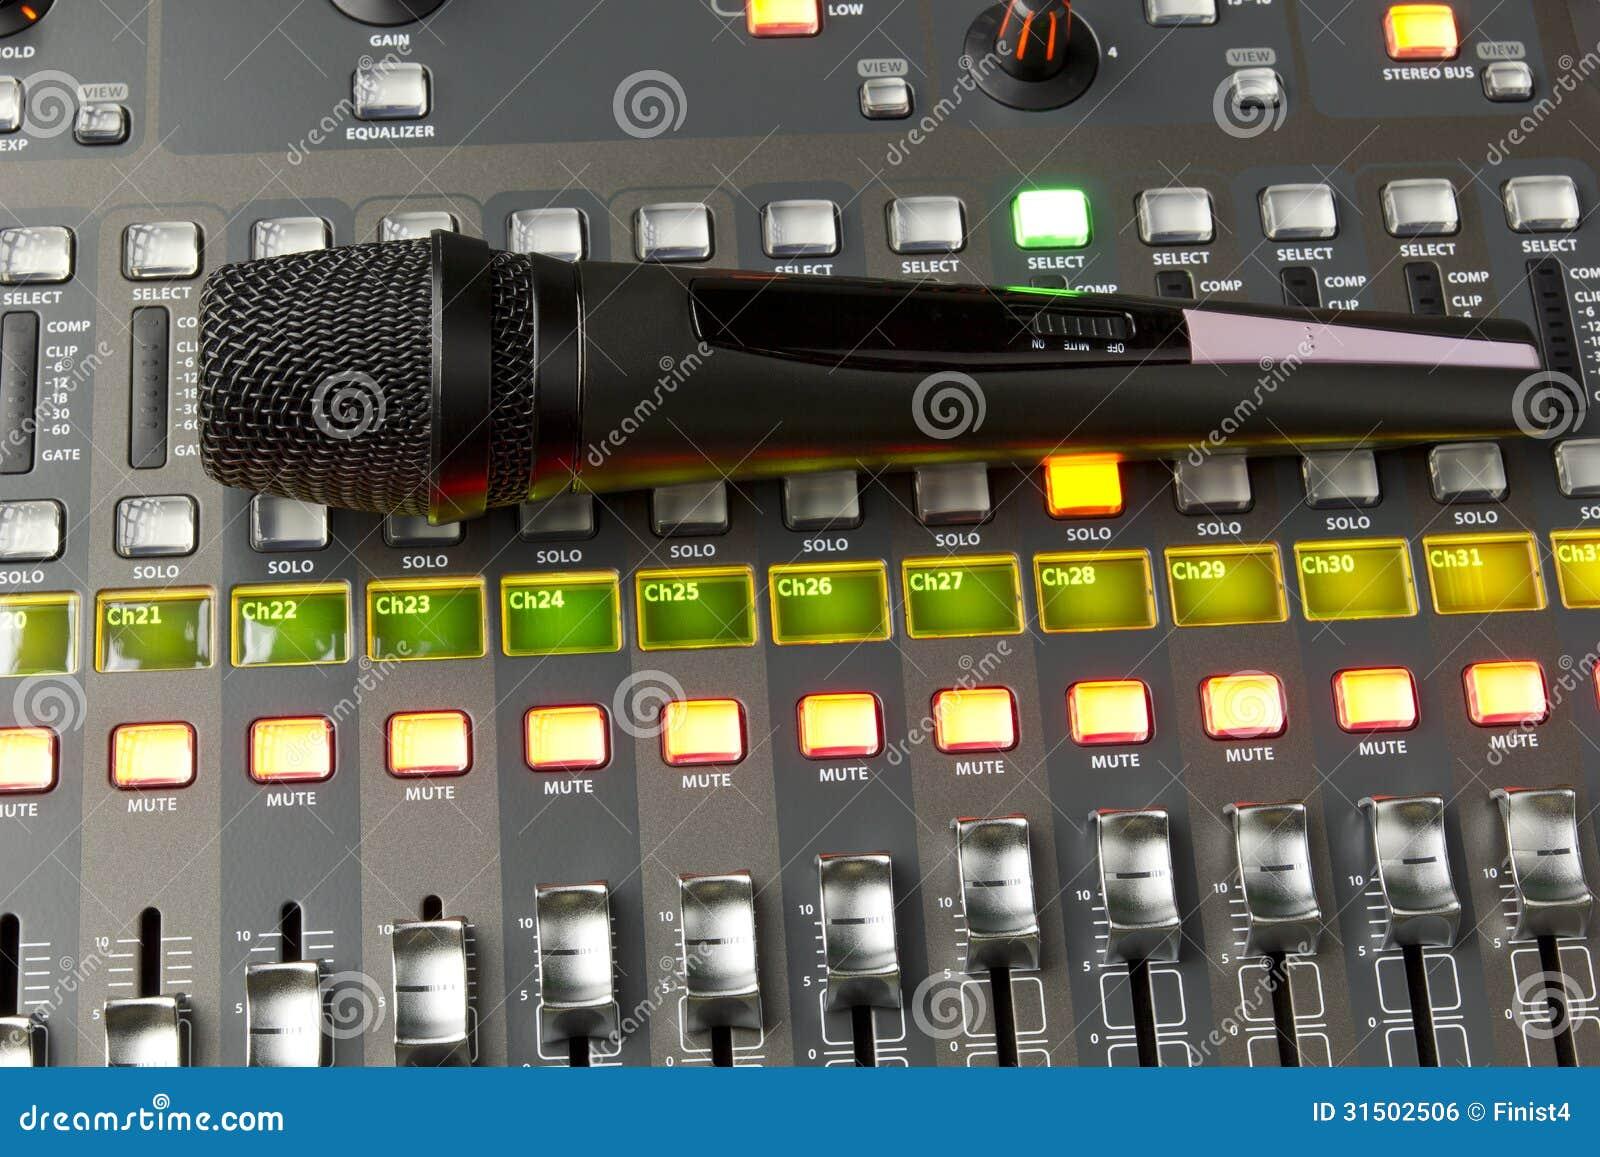 microphone mixer software download scholasp. Black Bedroom Furniture Sets. Home Design Ideas